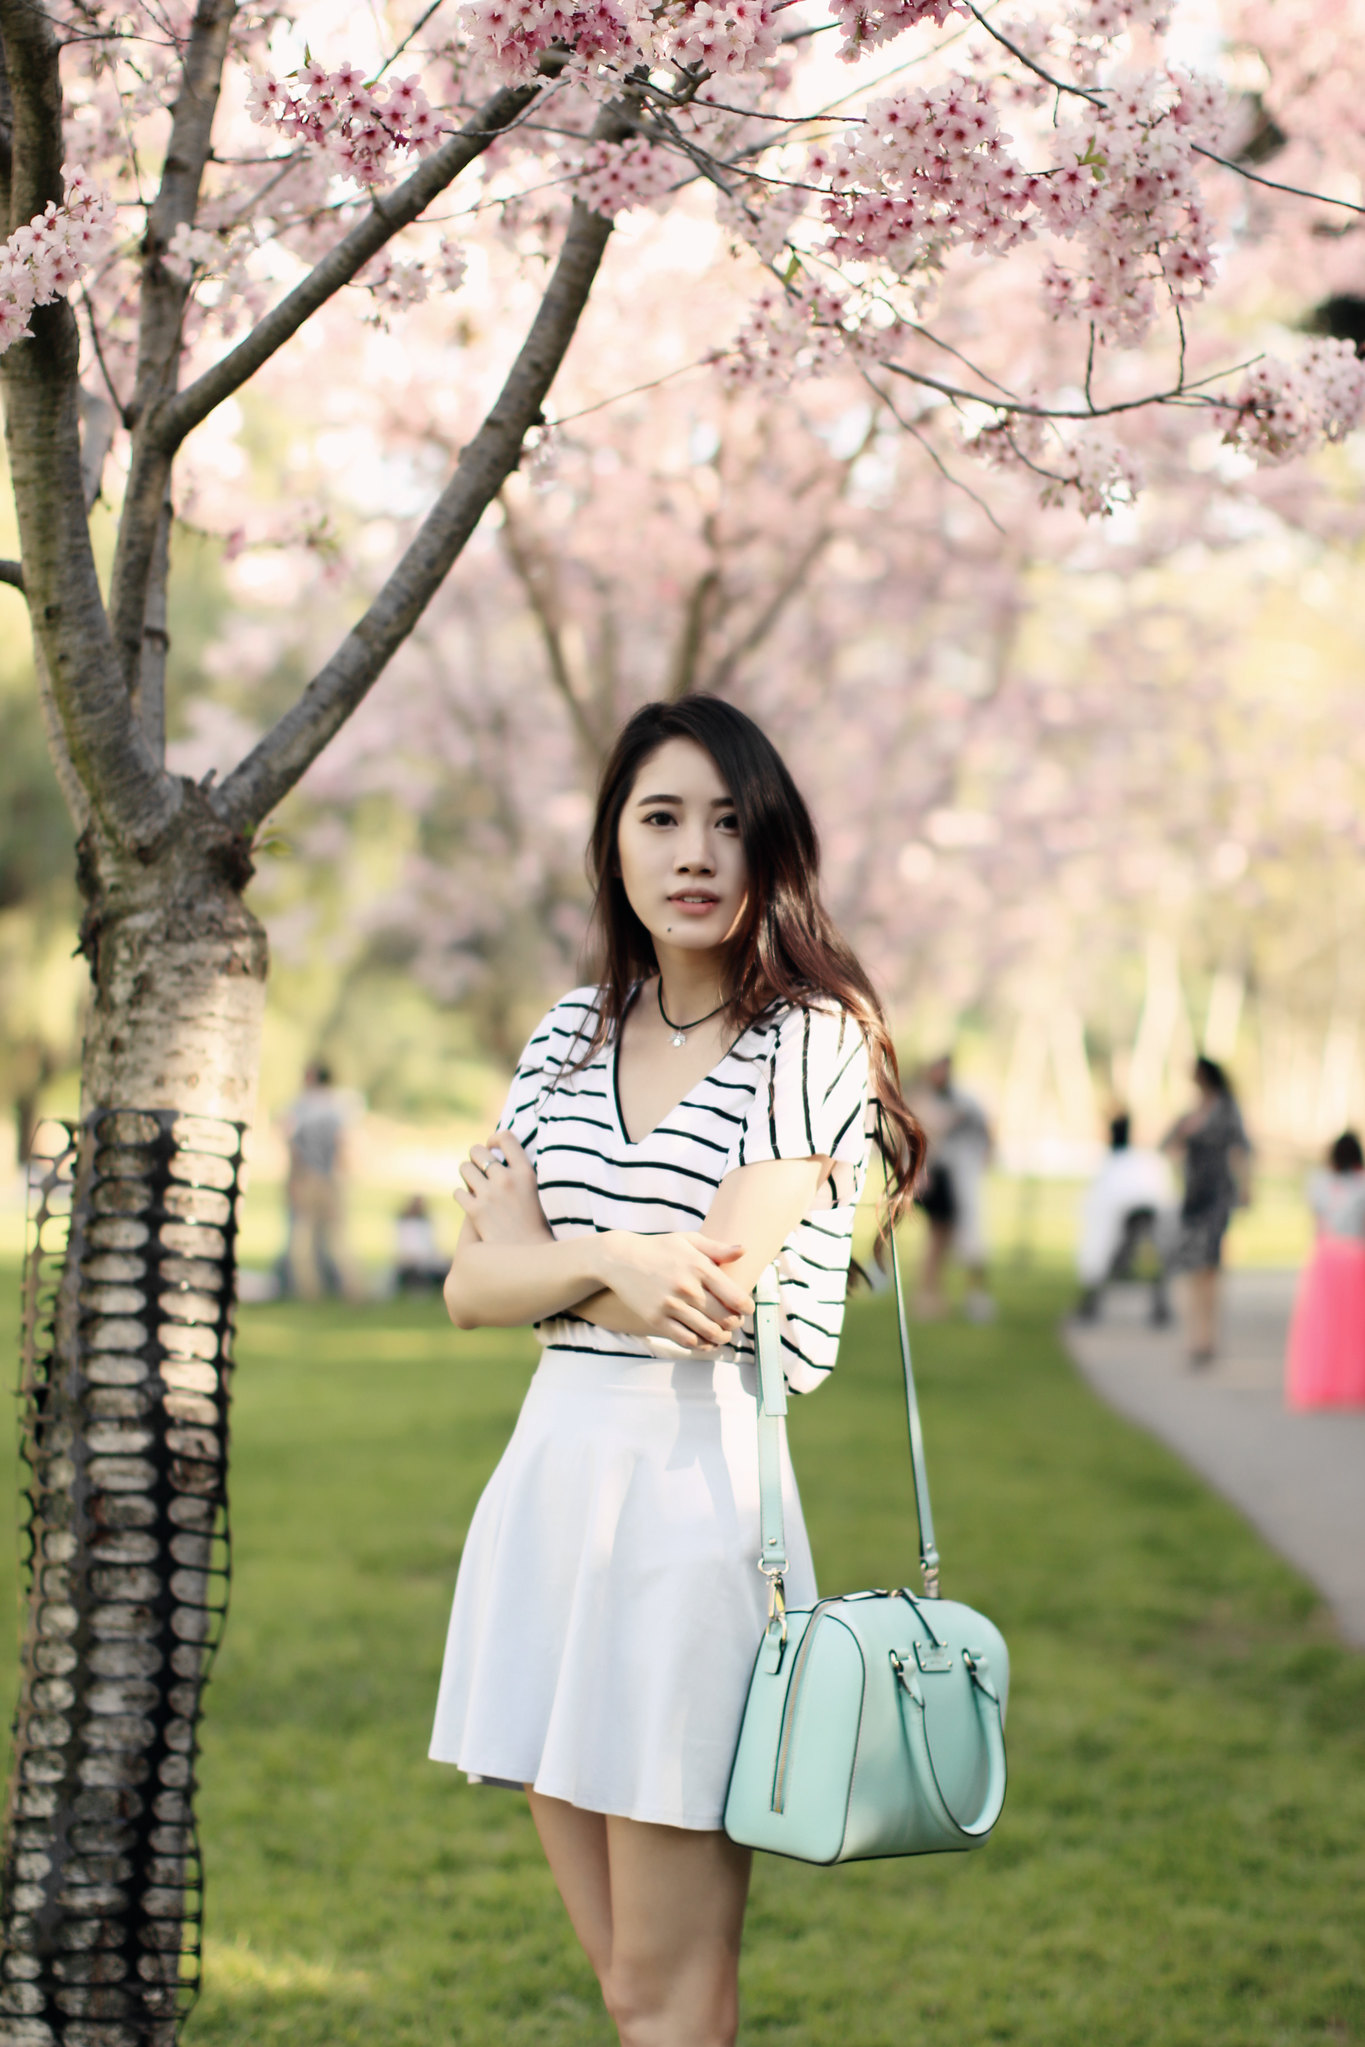 2416-ootd-fashion-style-wiwt-clothestoyouuu-elizabeeetht-express-f21-forever21-adidas-spring2017-springfashion